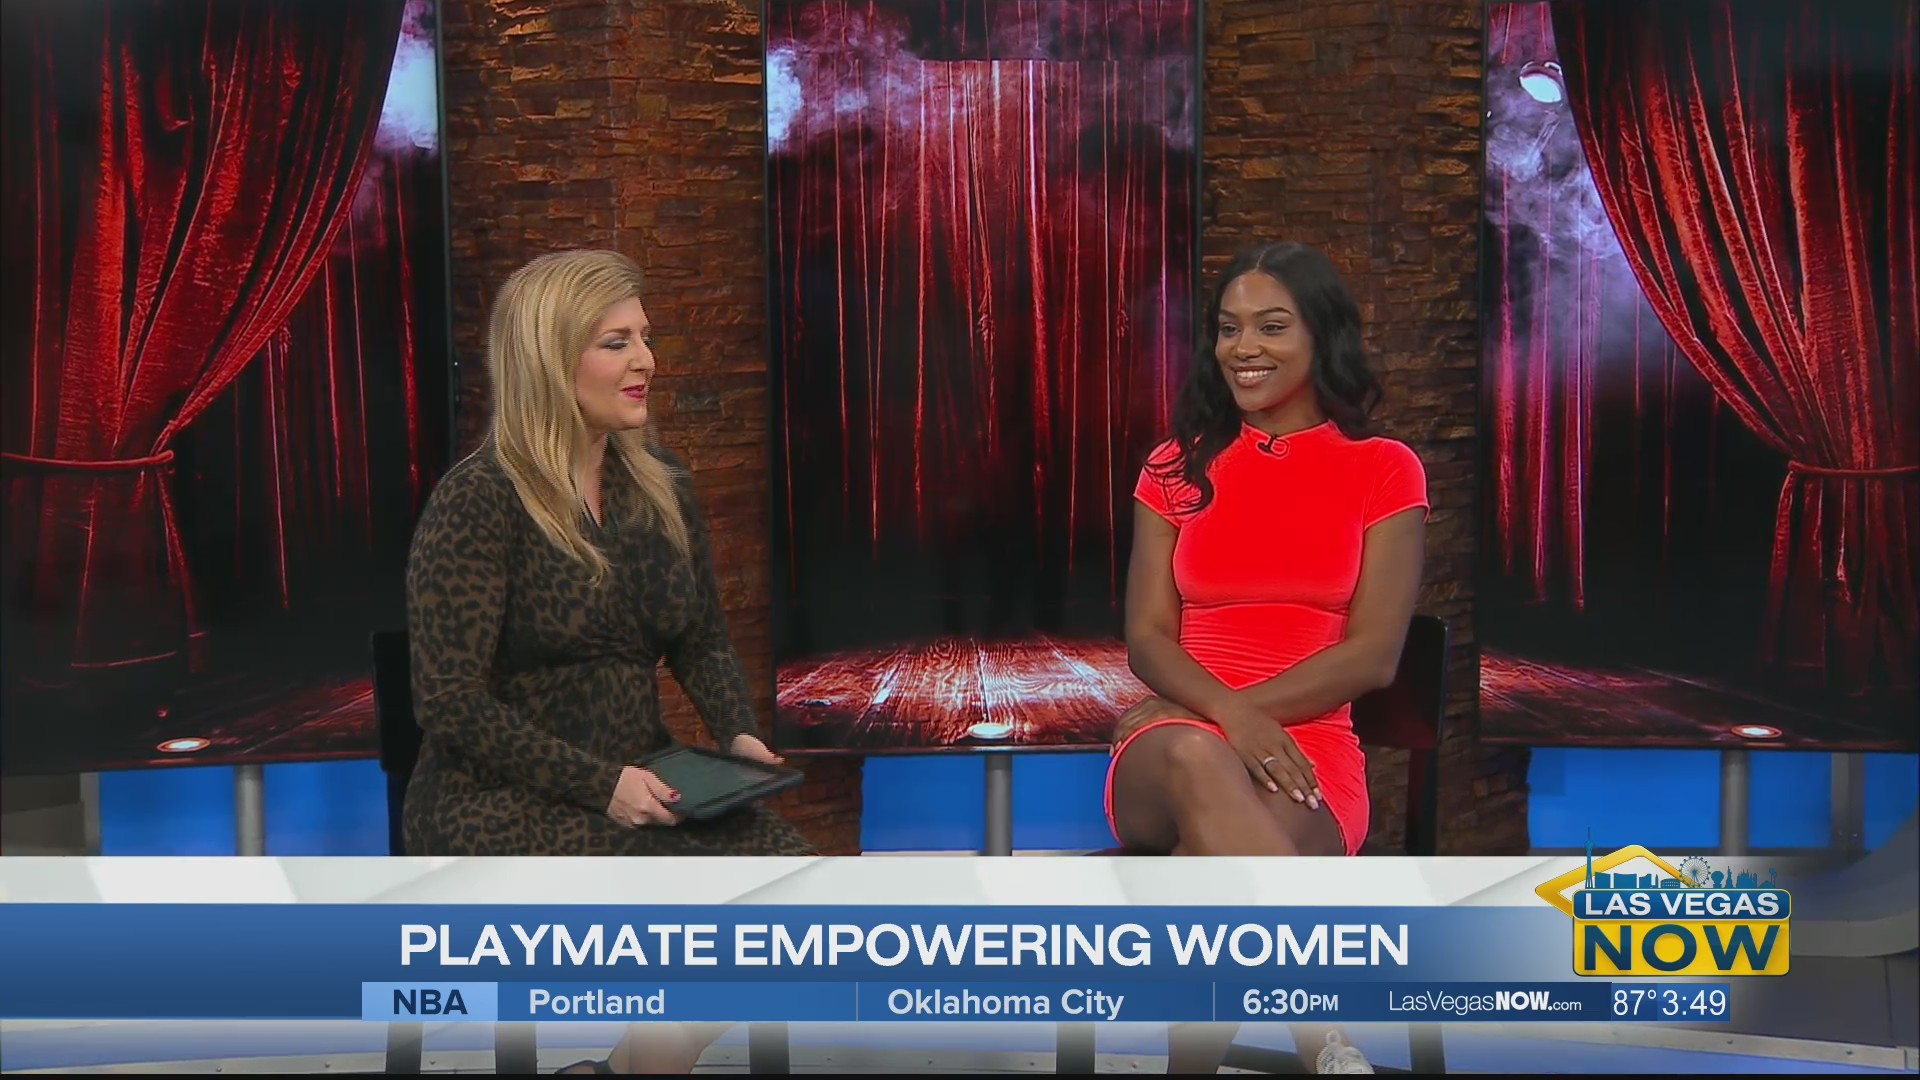 Playmate of the Year Jordan Emanuel on empowering women